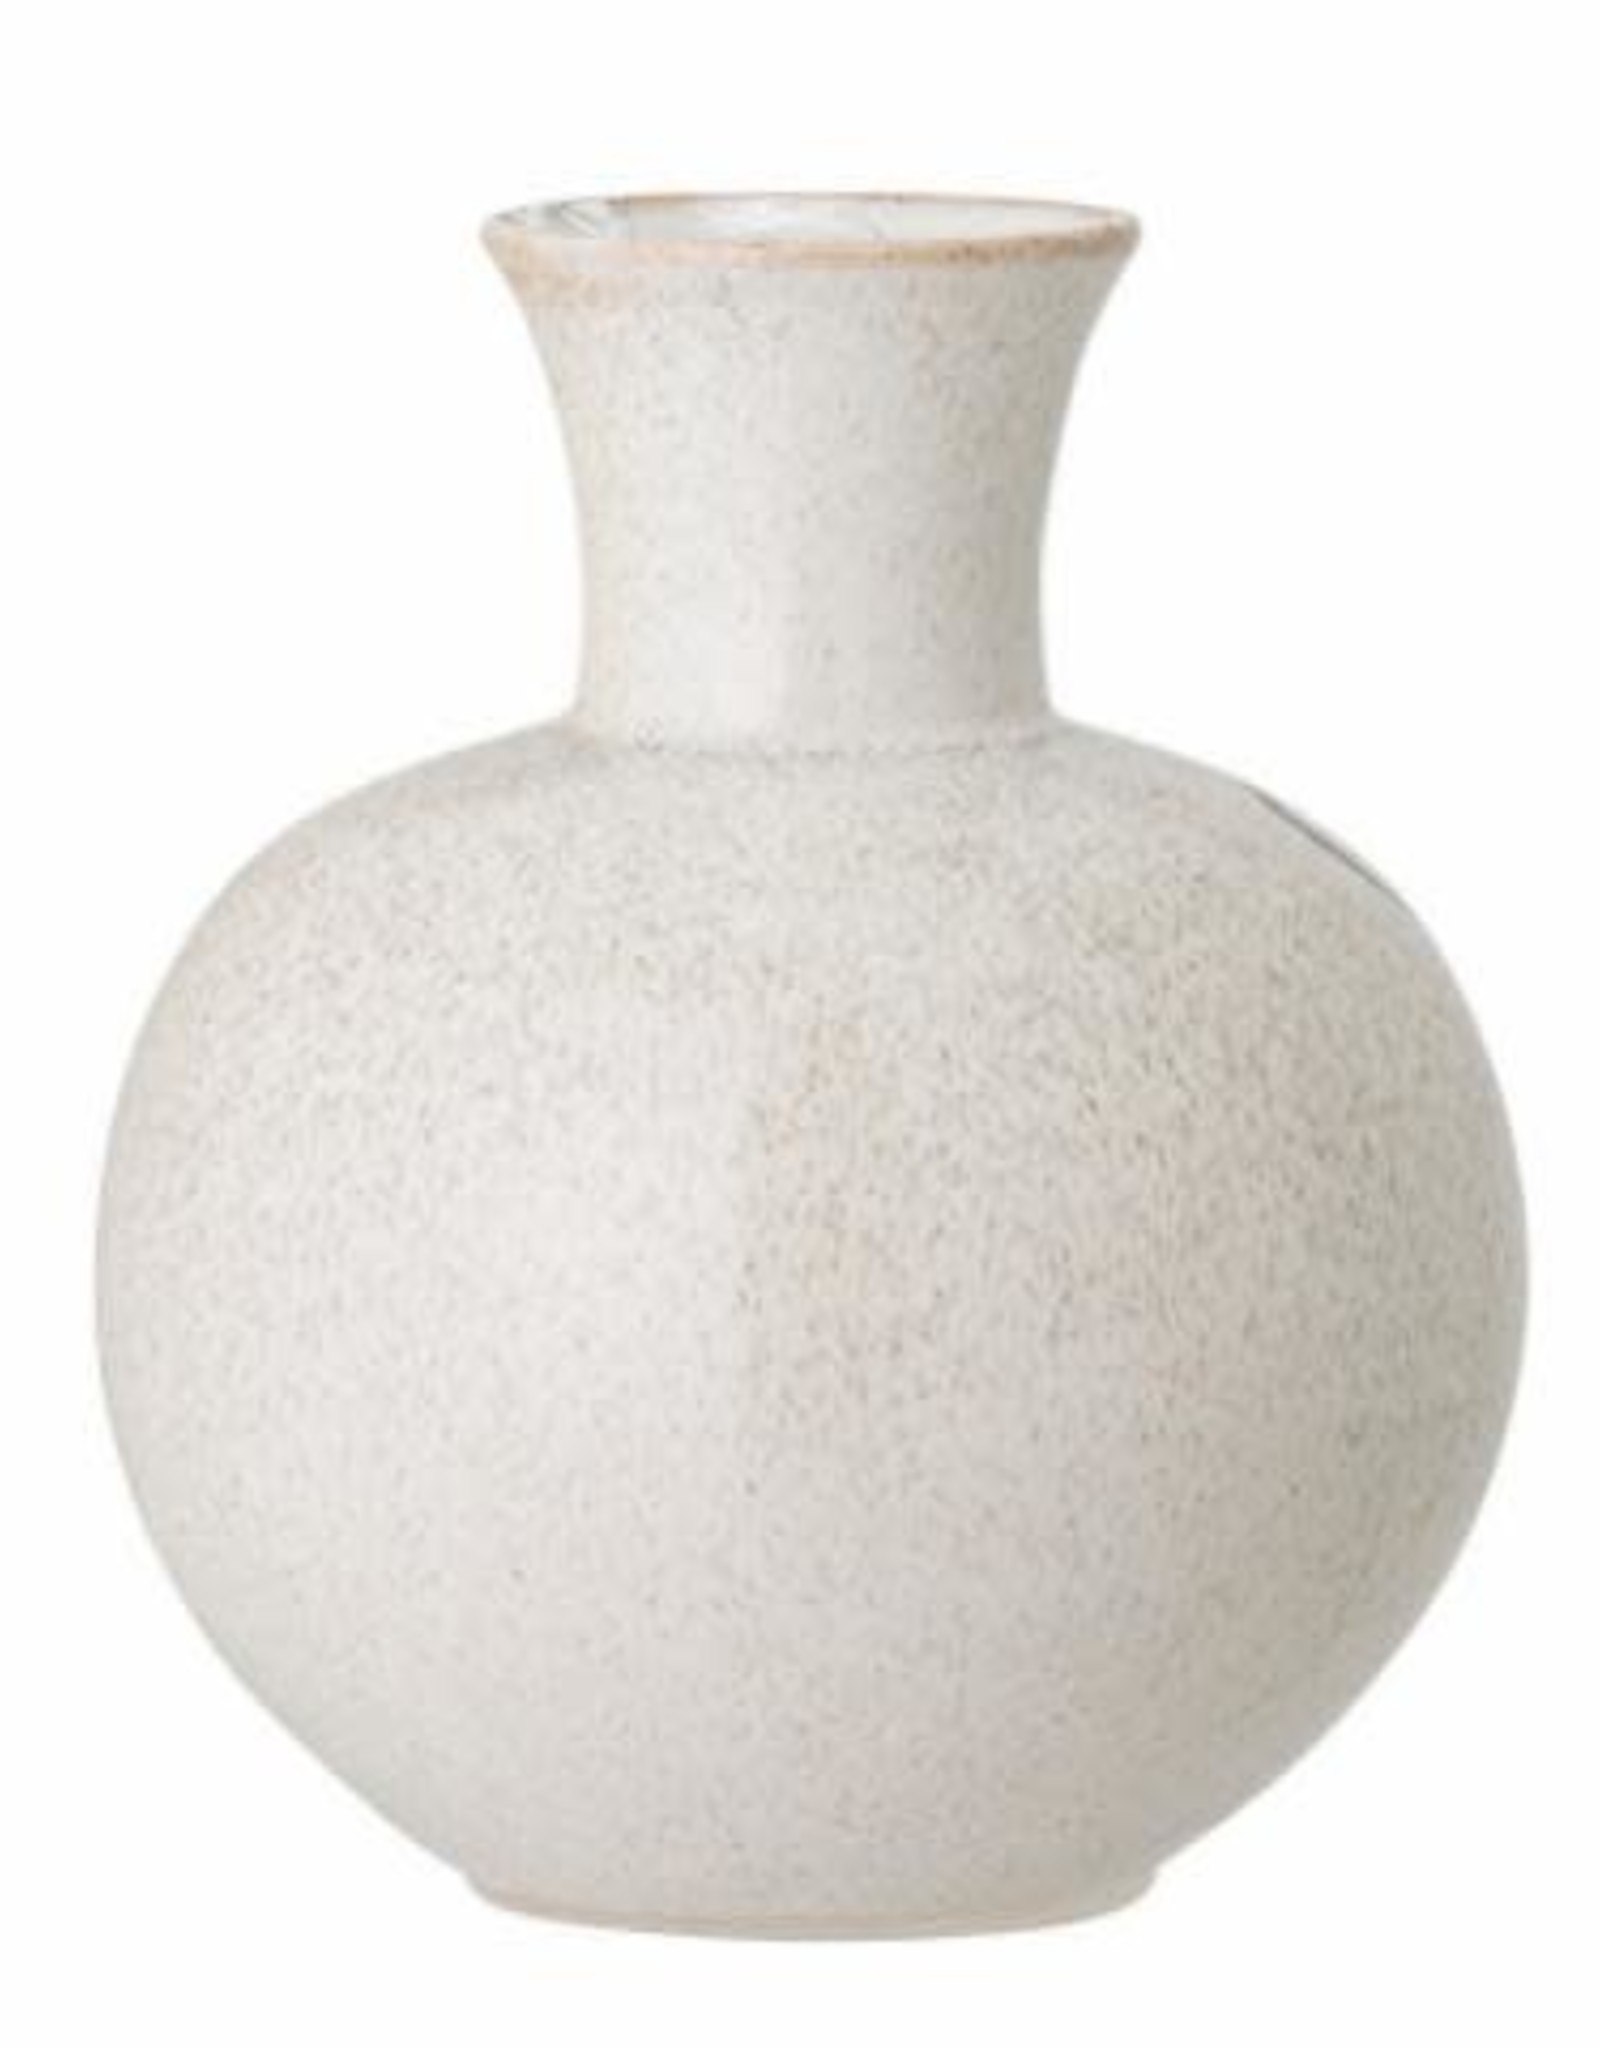 Bloomingville Bloomingville - Irini vase , white stoneware